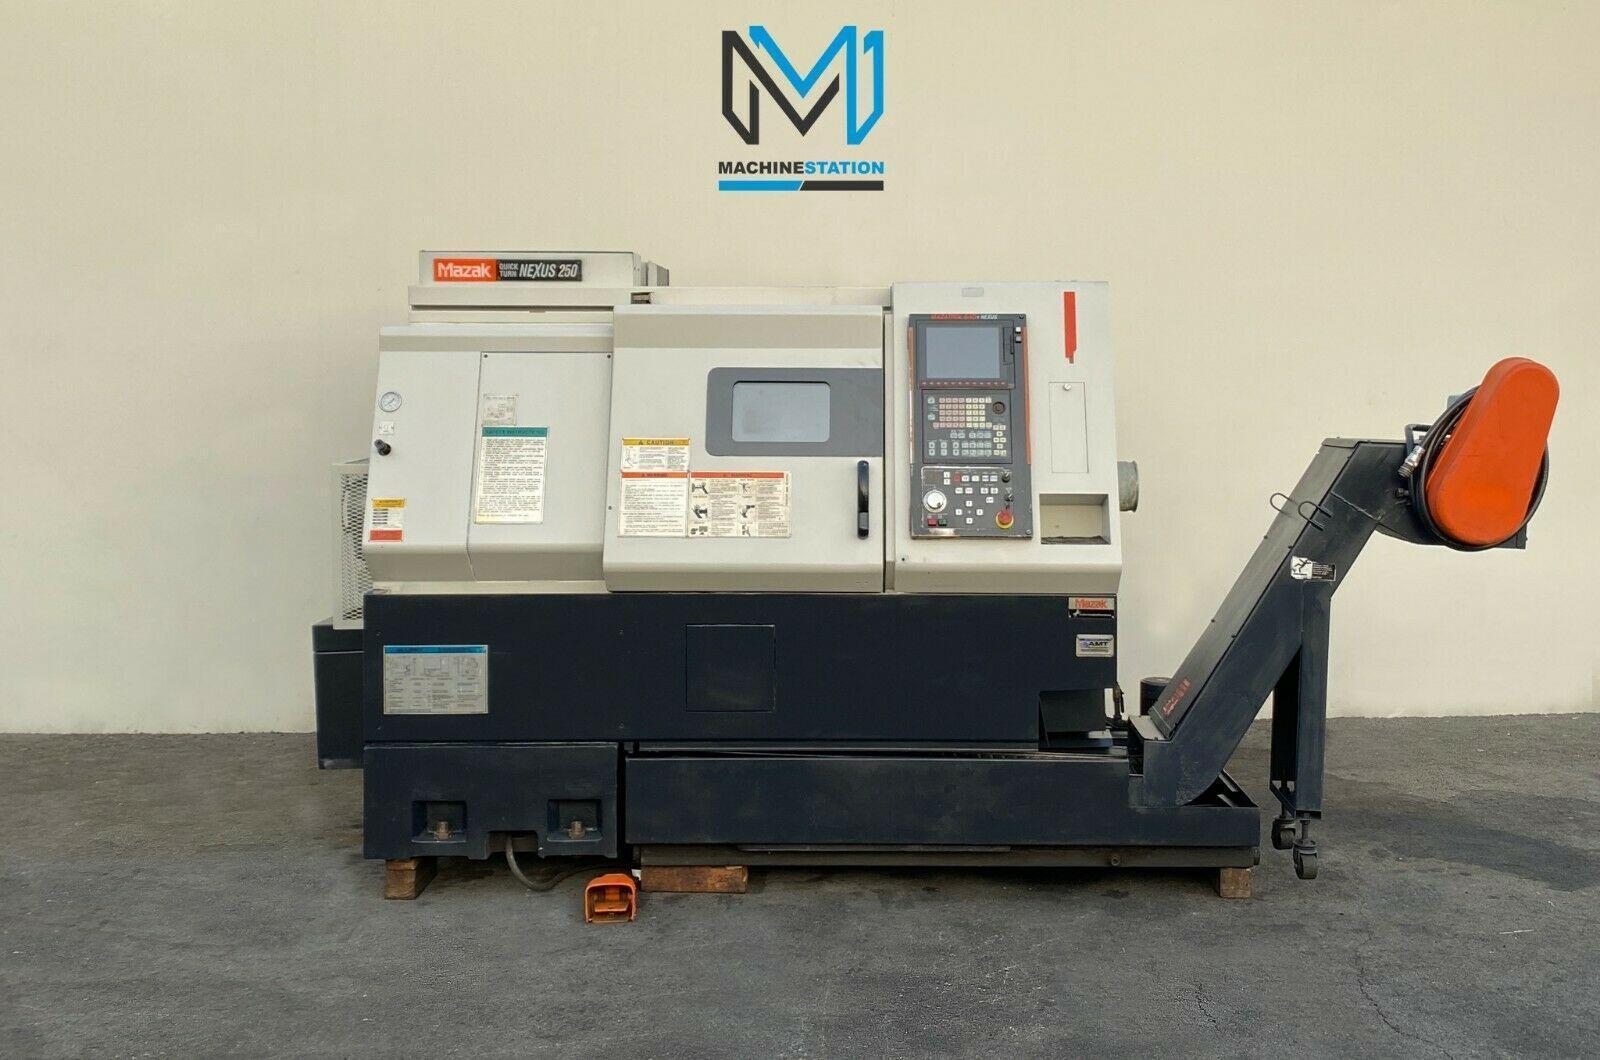 MAZAK QUICK TURN NEXUS QTN-250 CNC TURNING CENTER